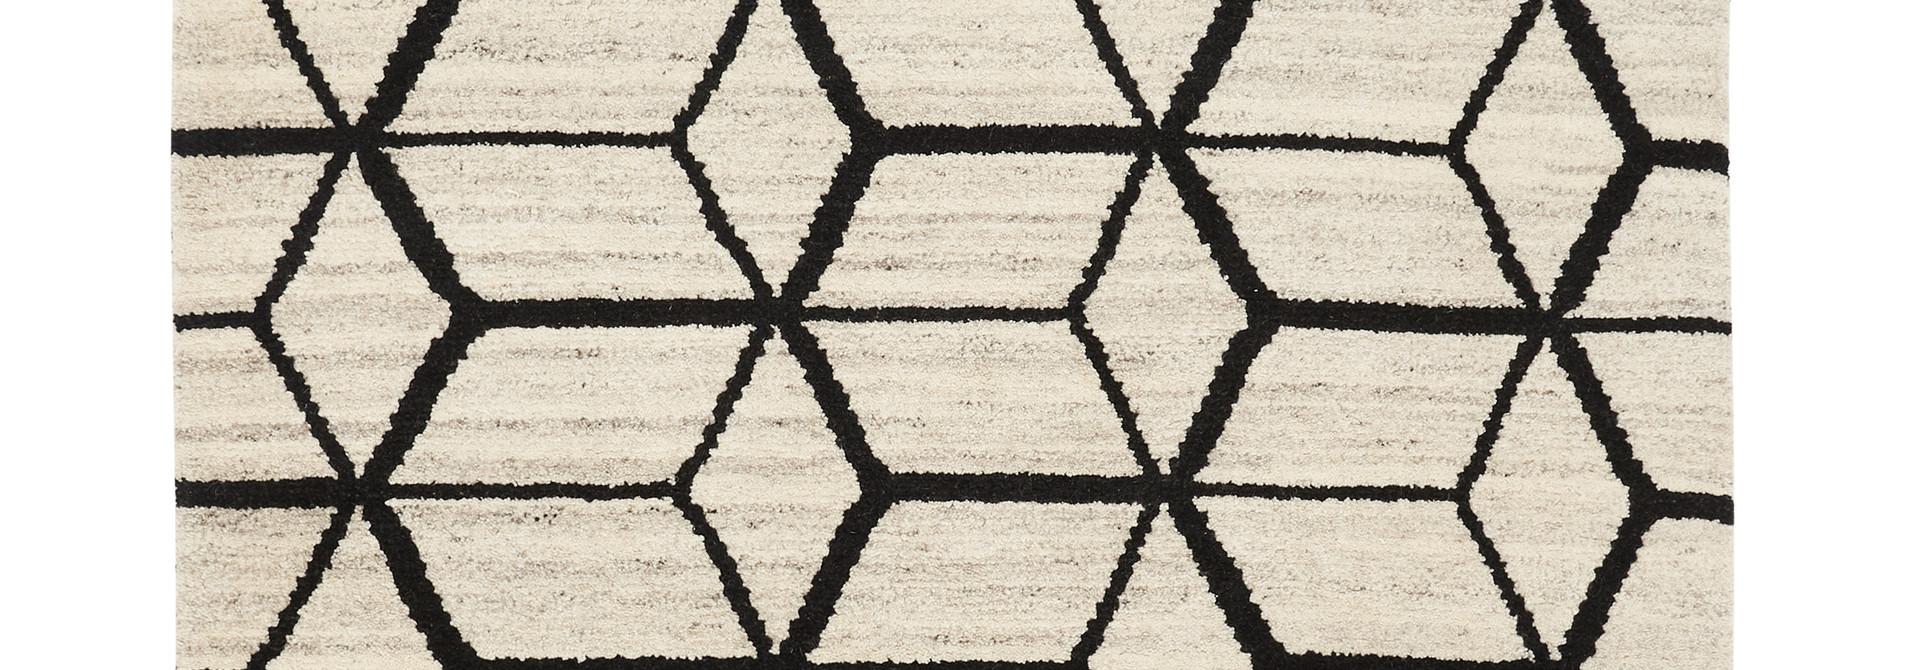 Brink en Campman Arabiska Geometrisk 63301